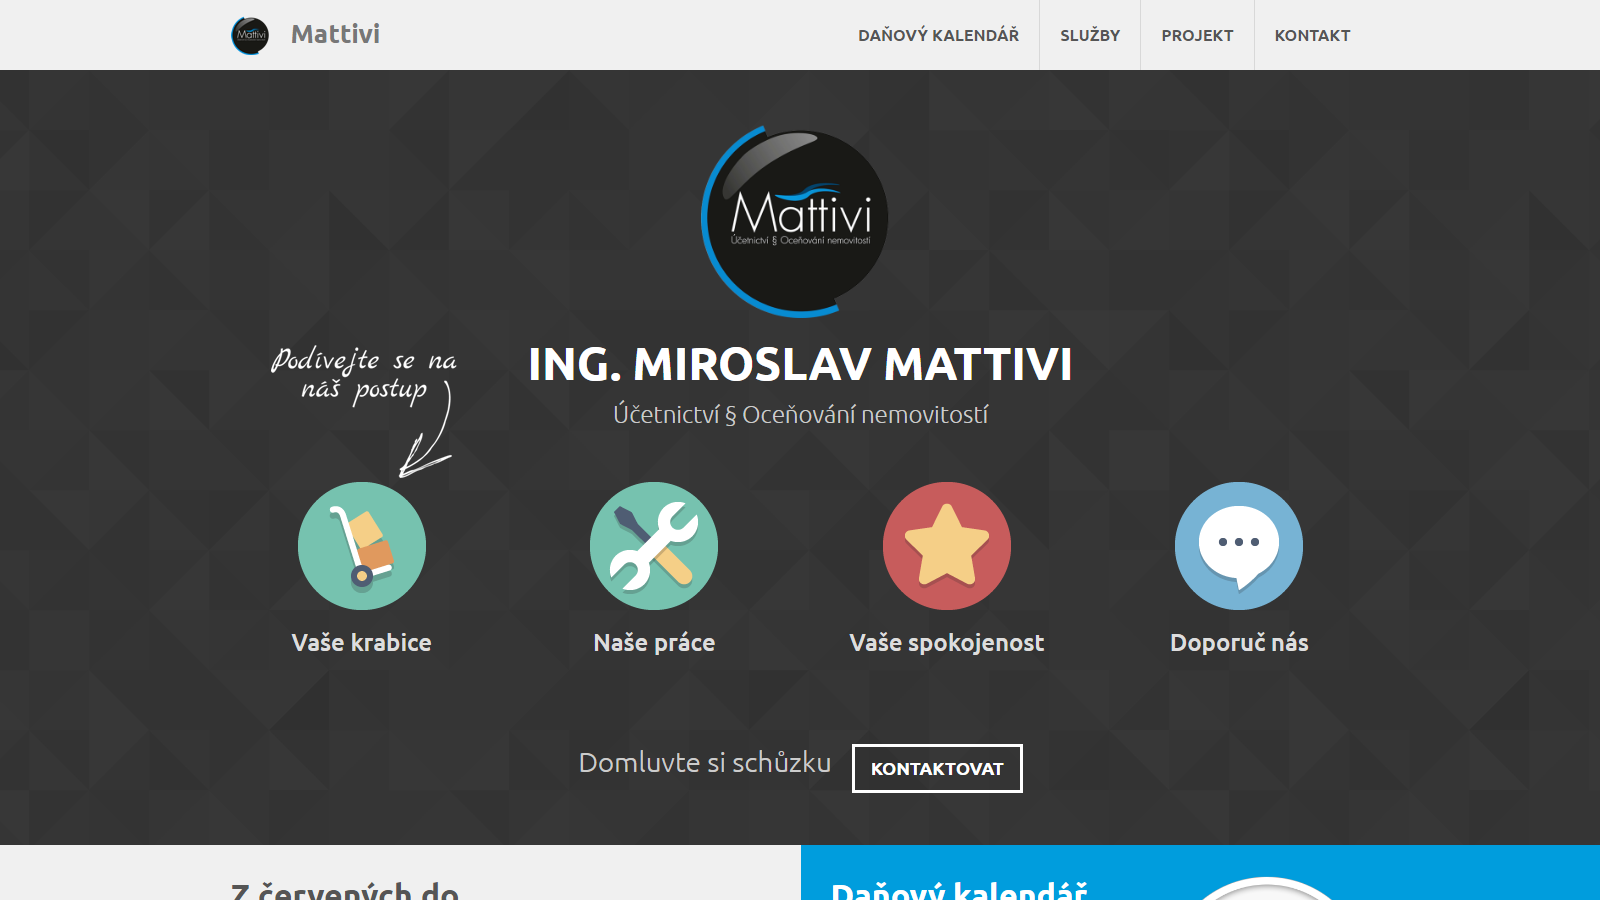 Miroslav Mattivi